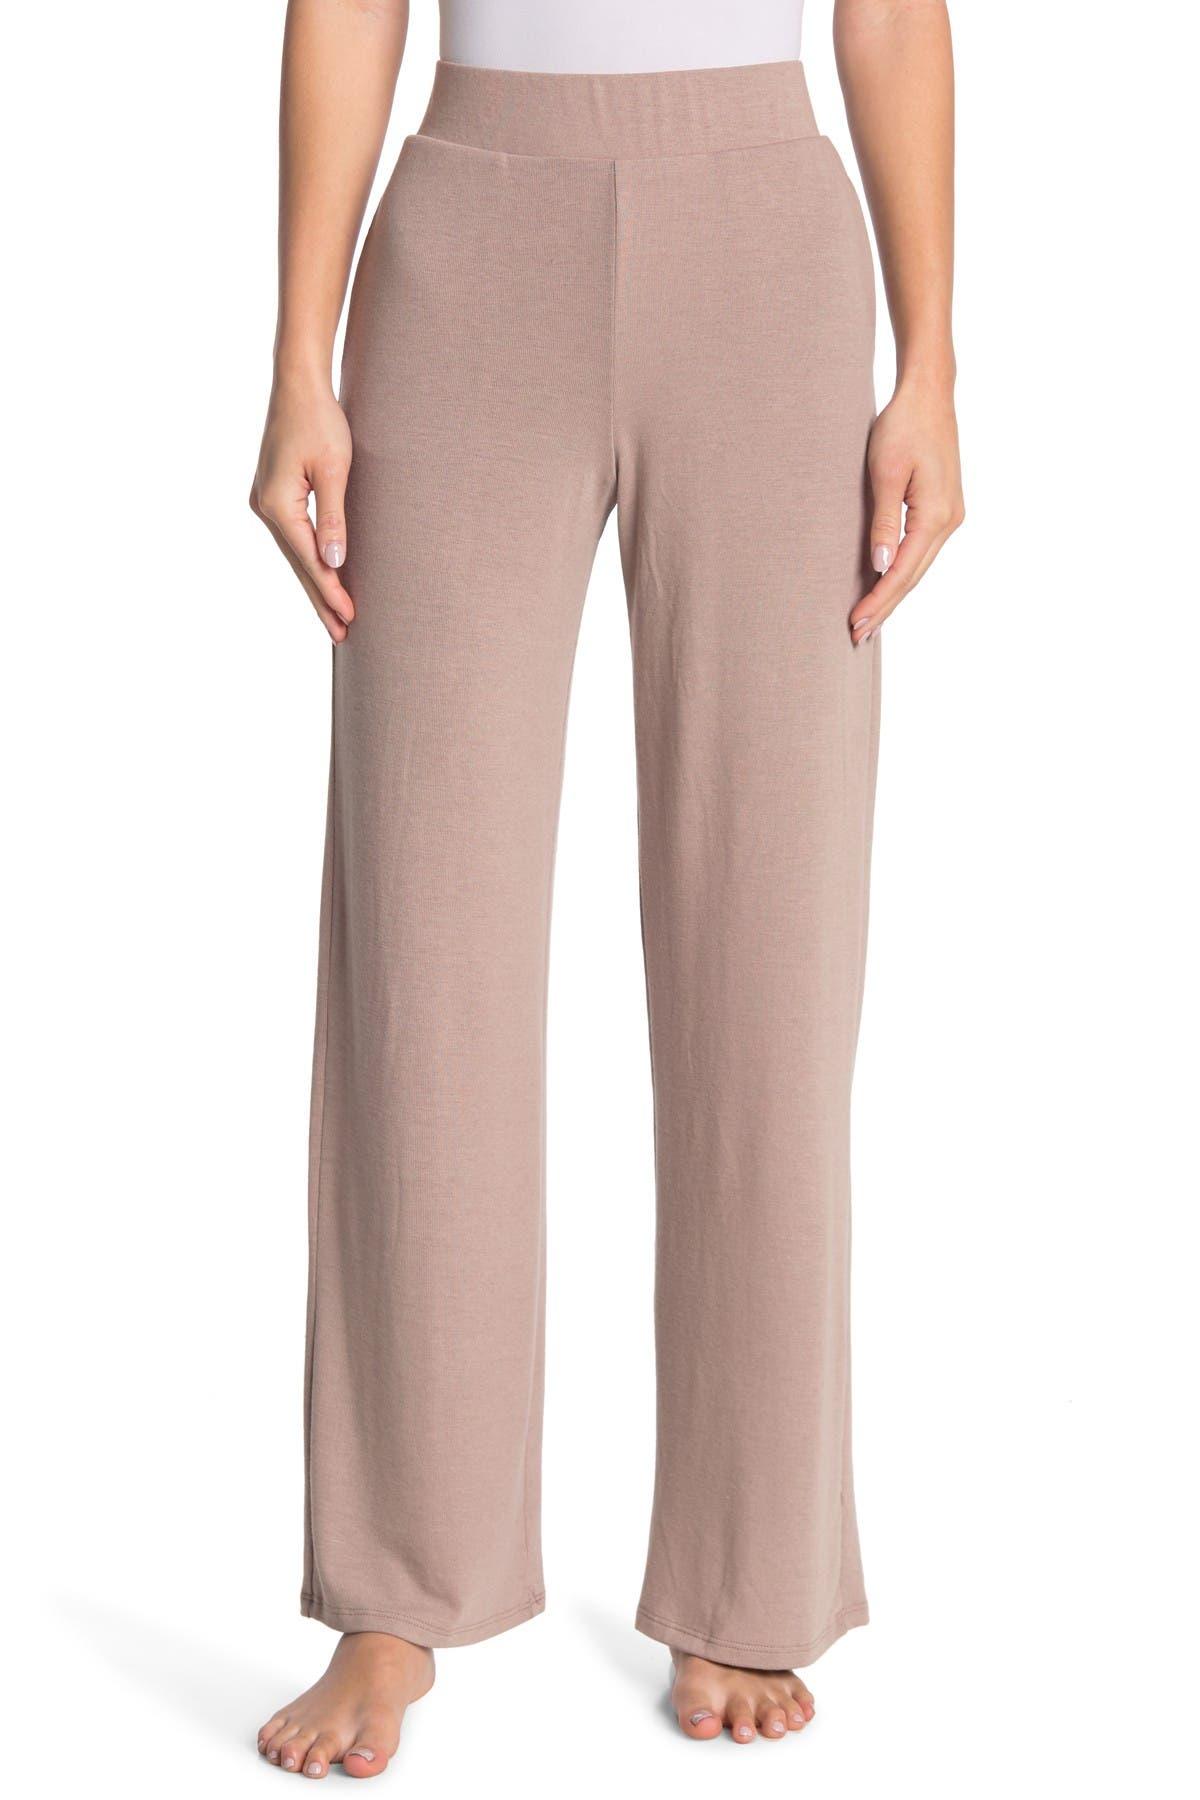 Image of Socialite Brushed Knit Lounge Pants